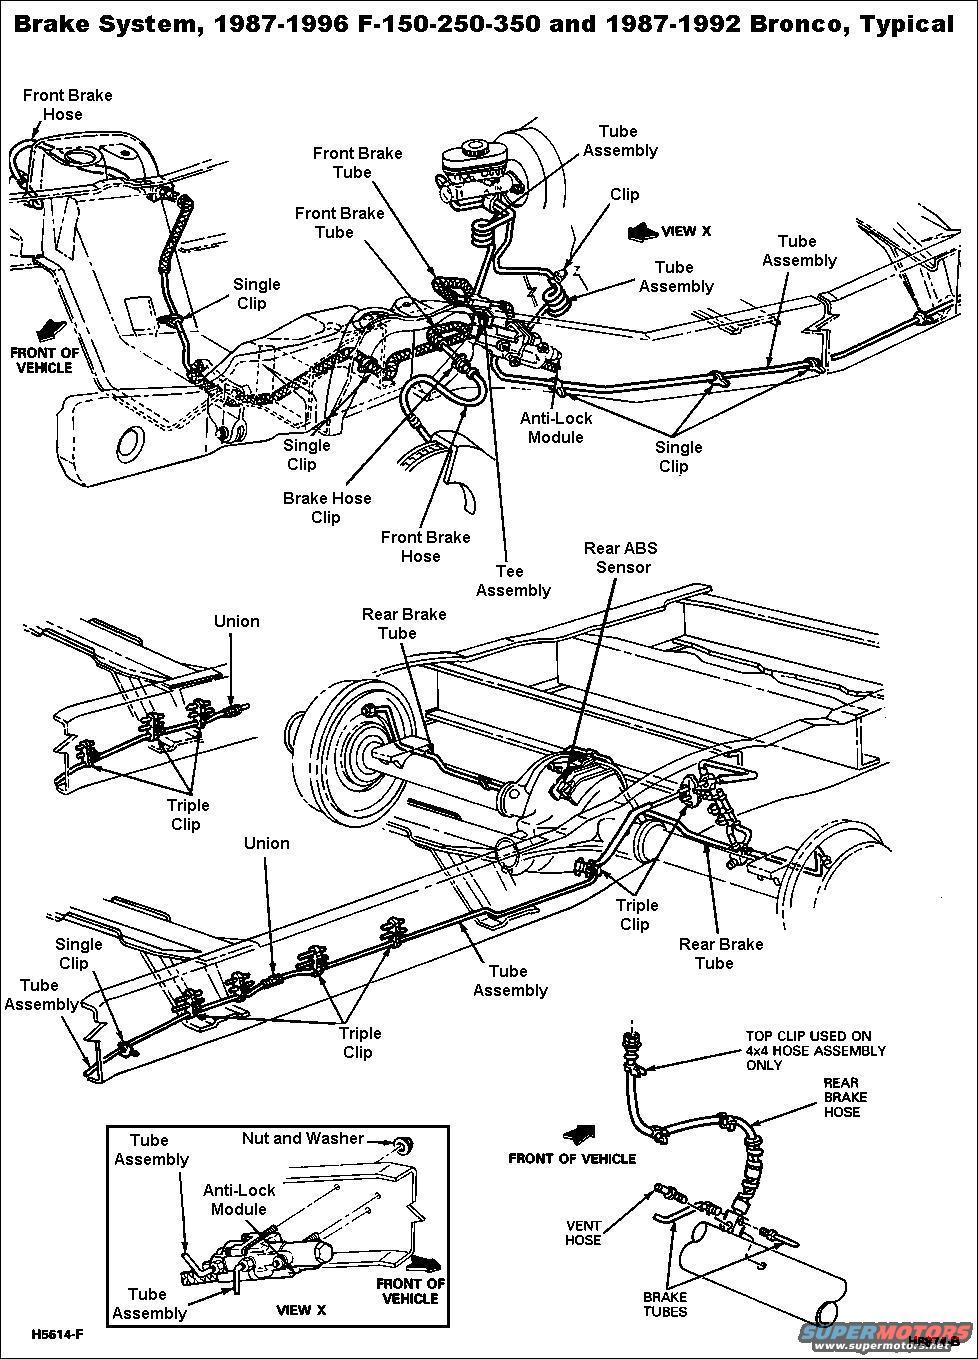 Brake Lining Diagram : Ford f light wiring diagram auto